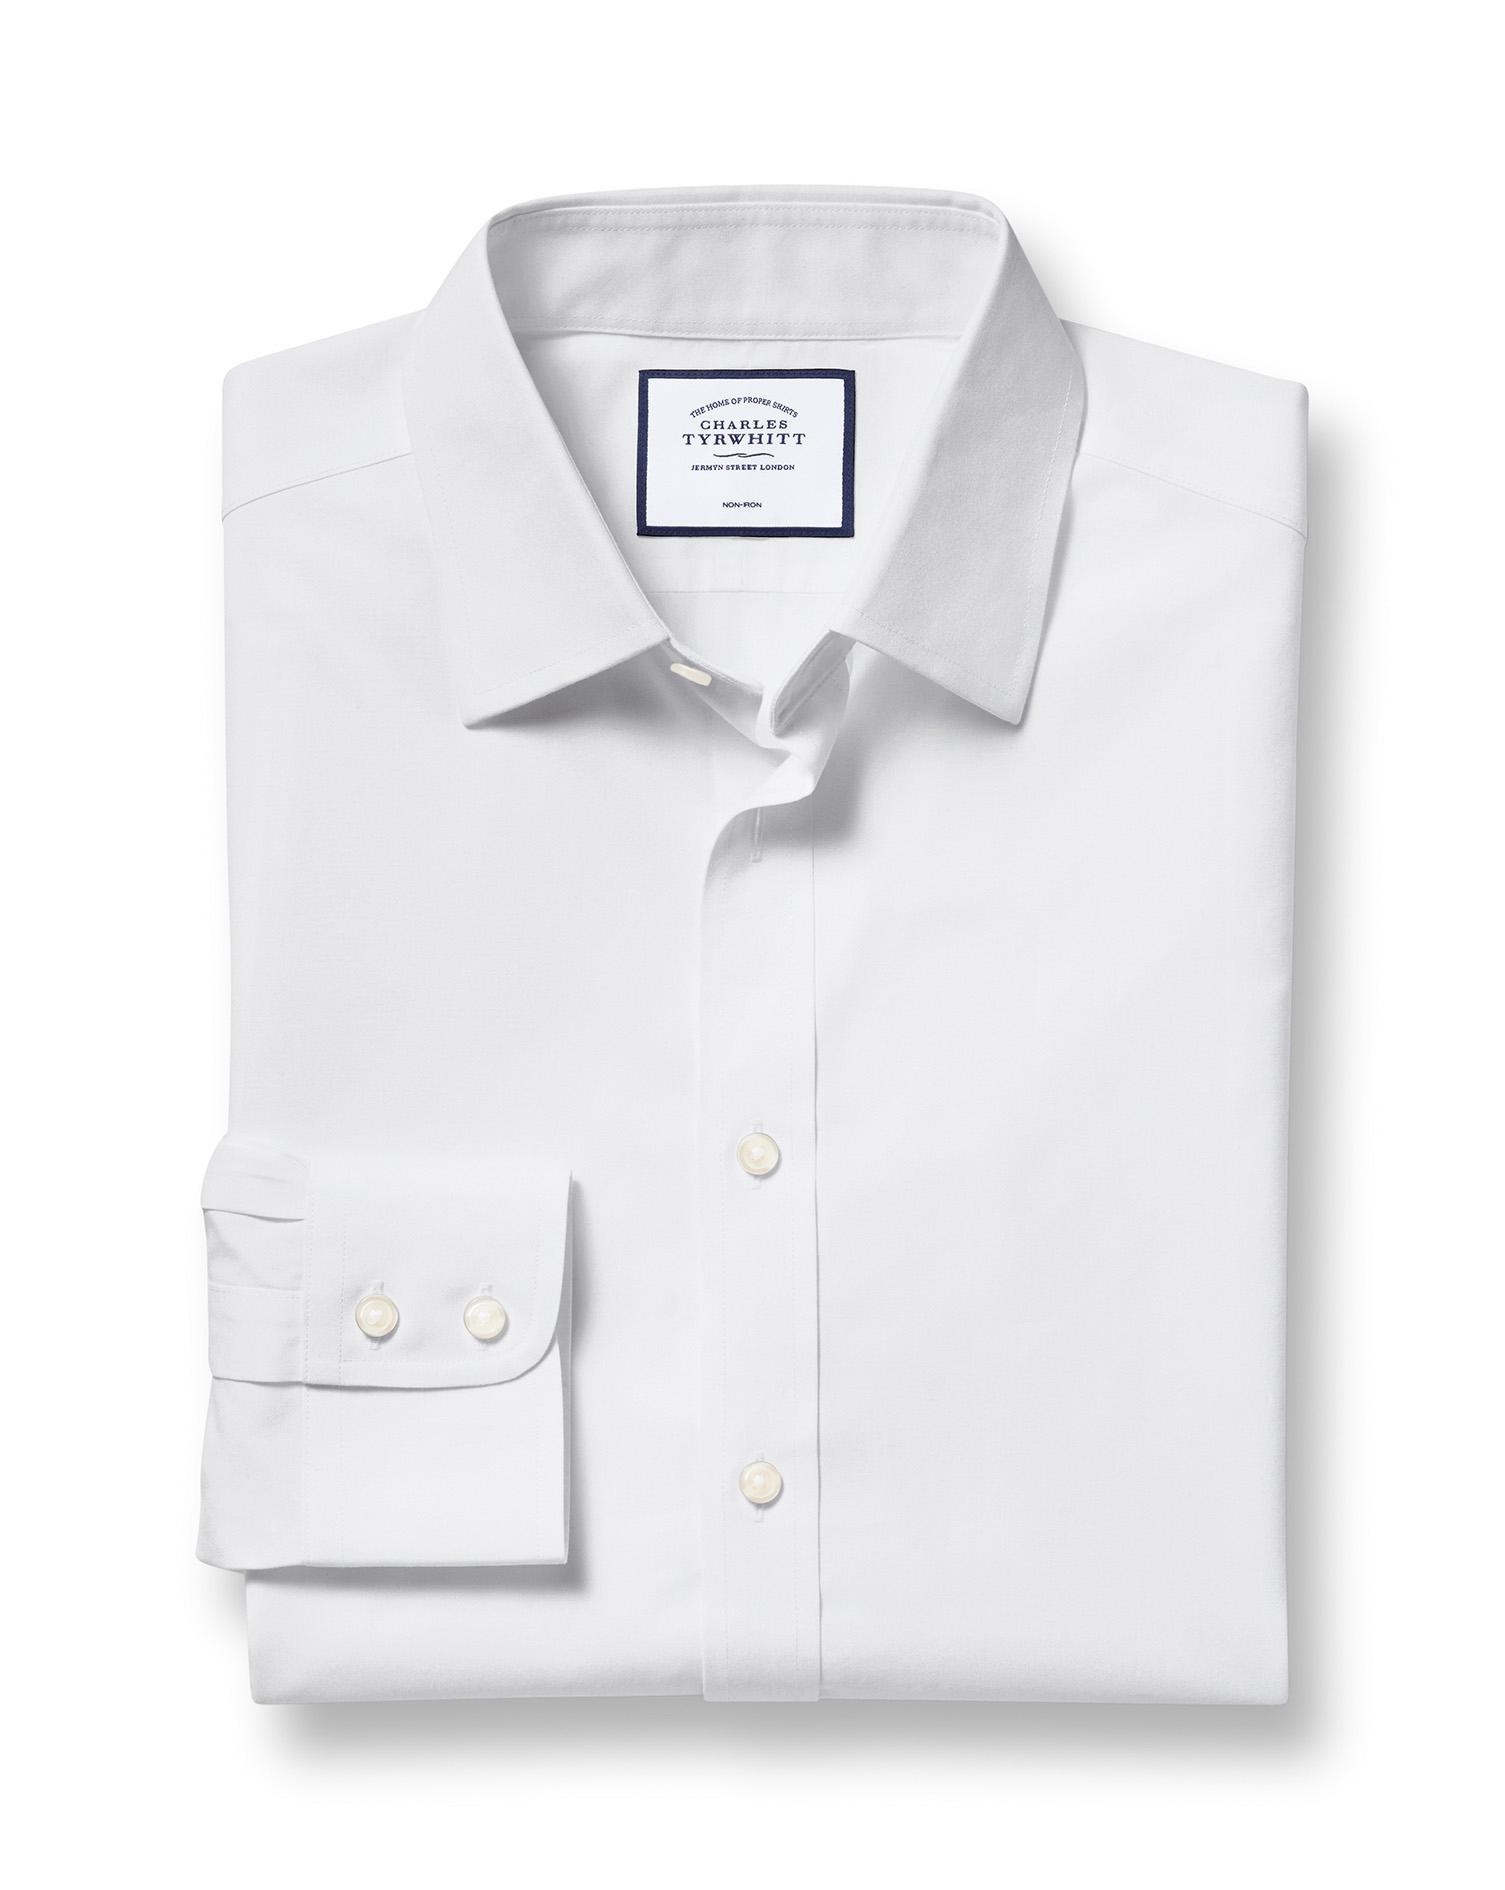 Extra Slim Fit Non-Iron Poplin White Cotton Formal Shirt Single Cuff Size 17/35 by Charles Tyrwhitt